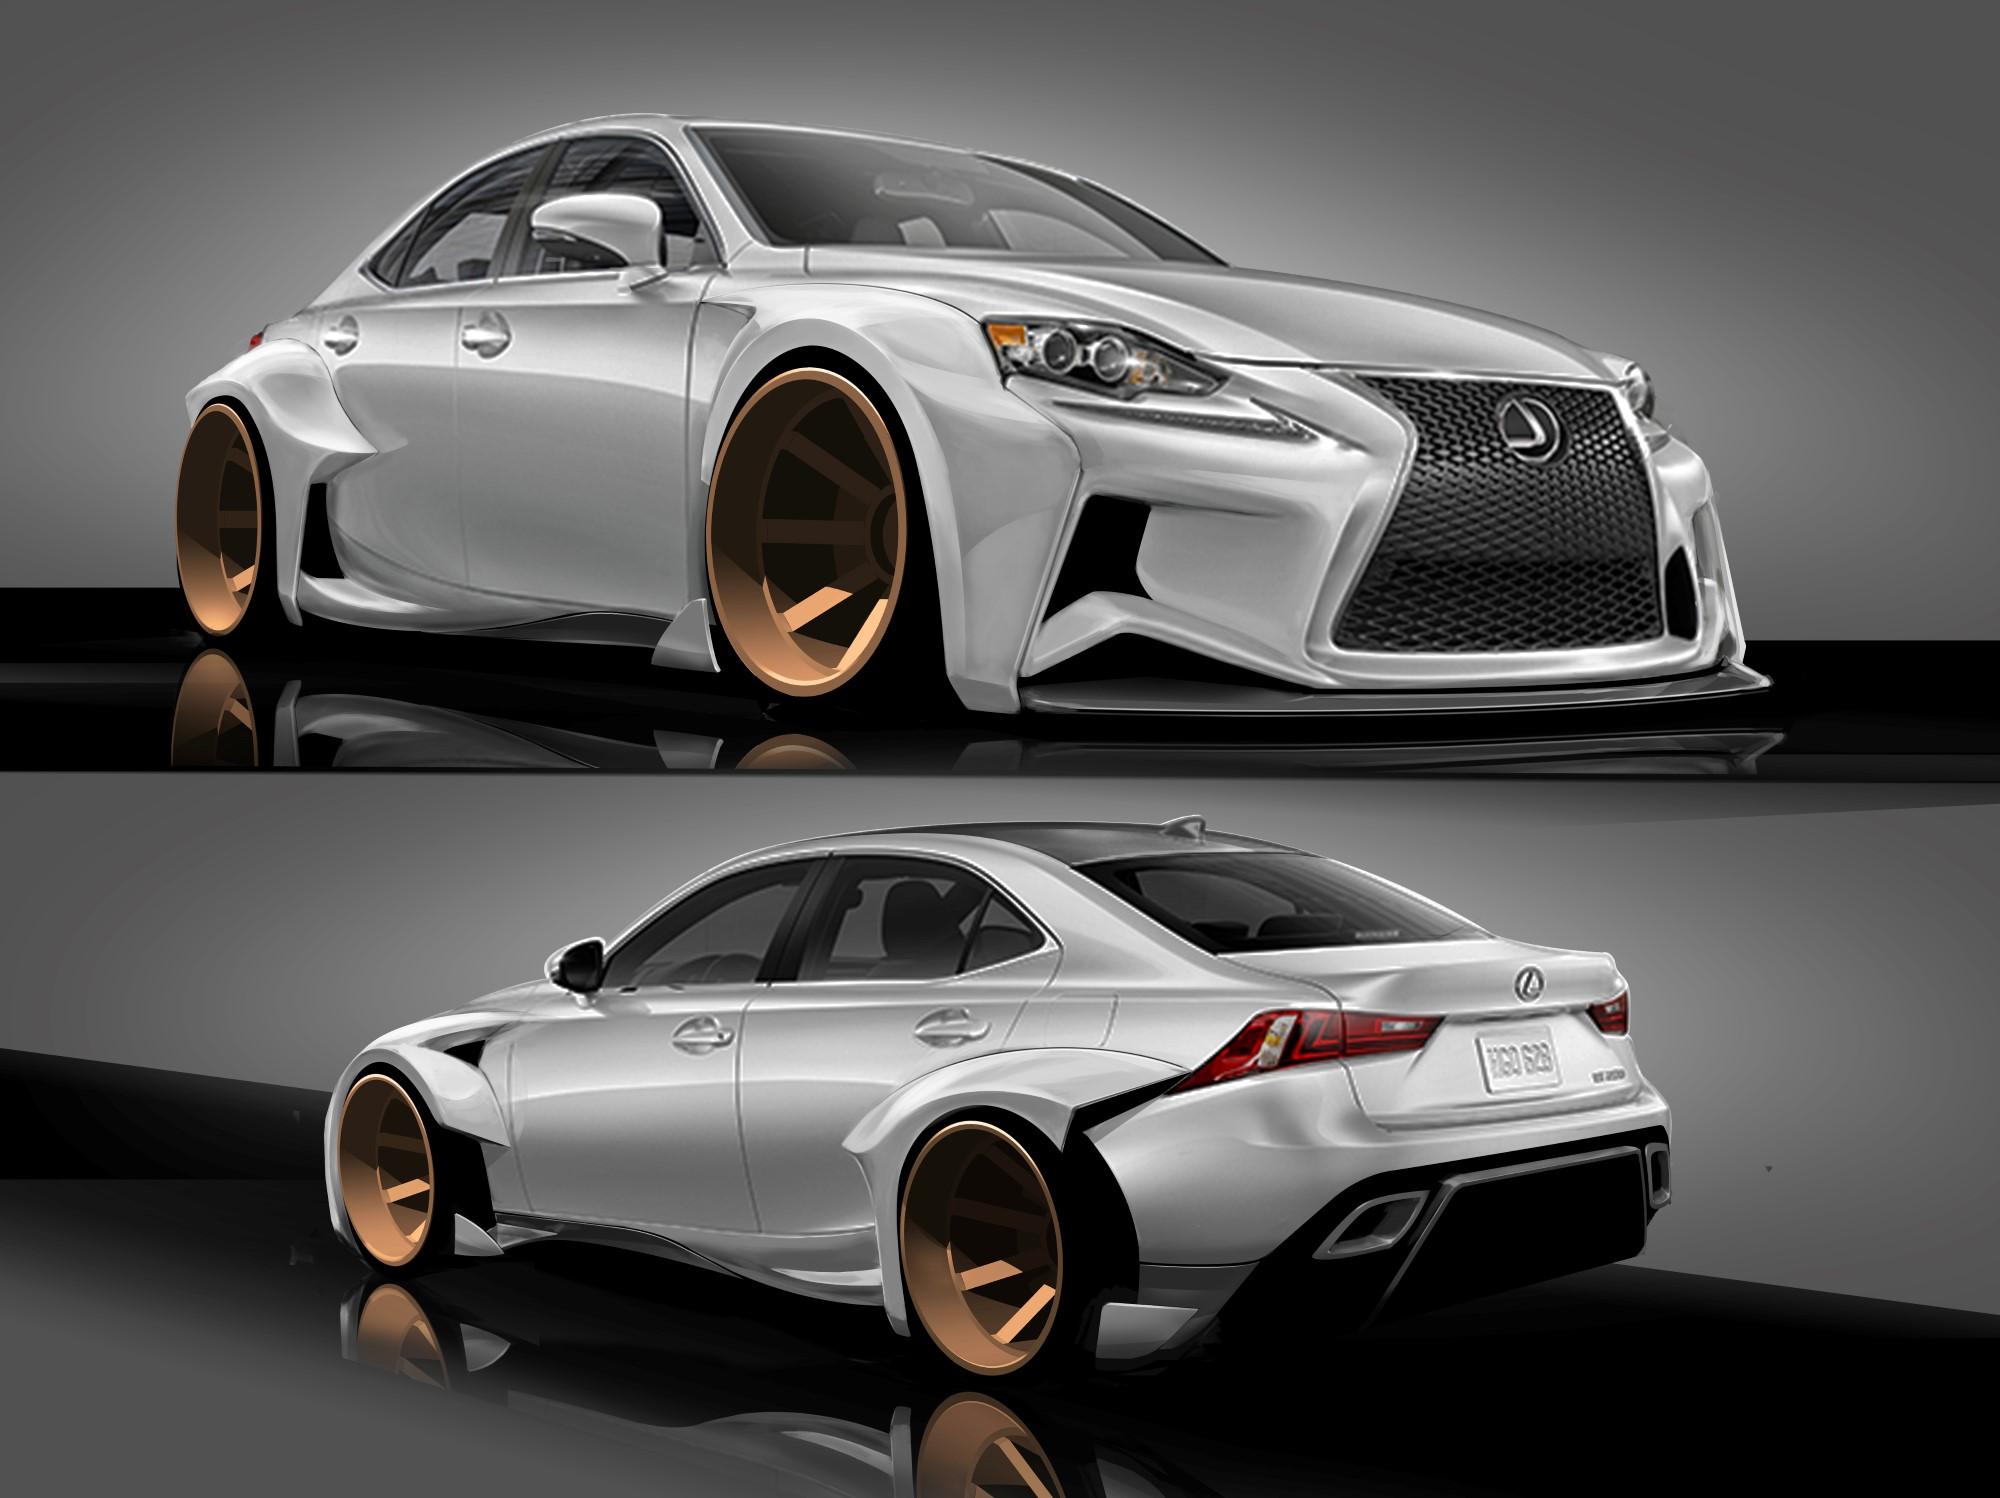 2014 Lexus IS SEMA Concept Gets DeviantART Design